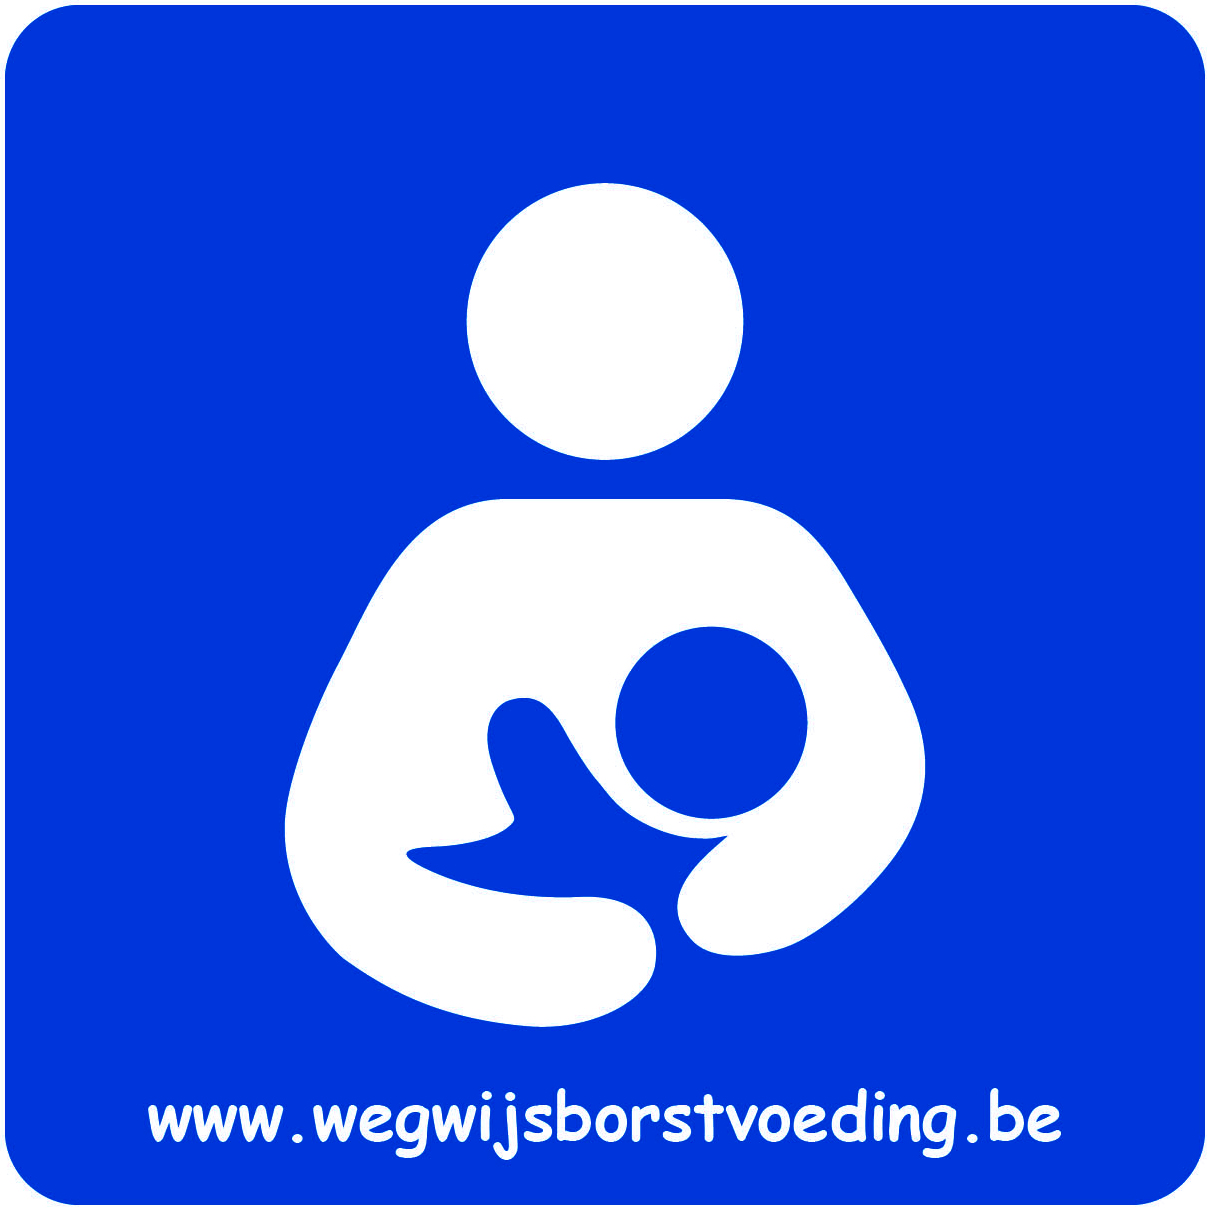 Wegwijs borstvoeding